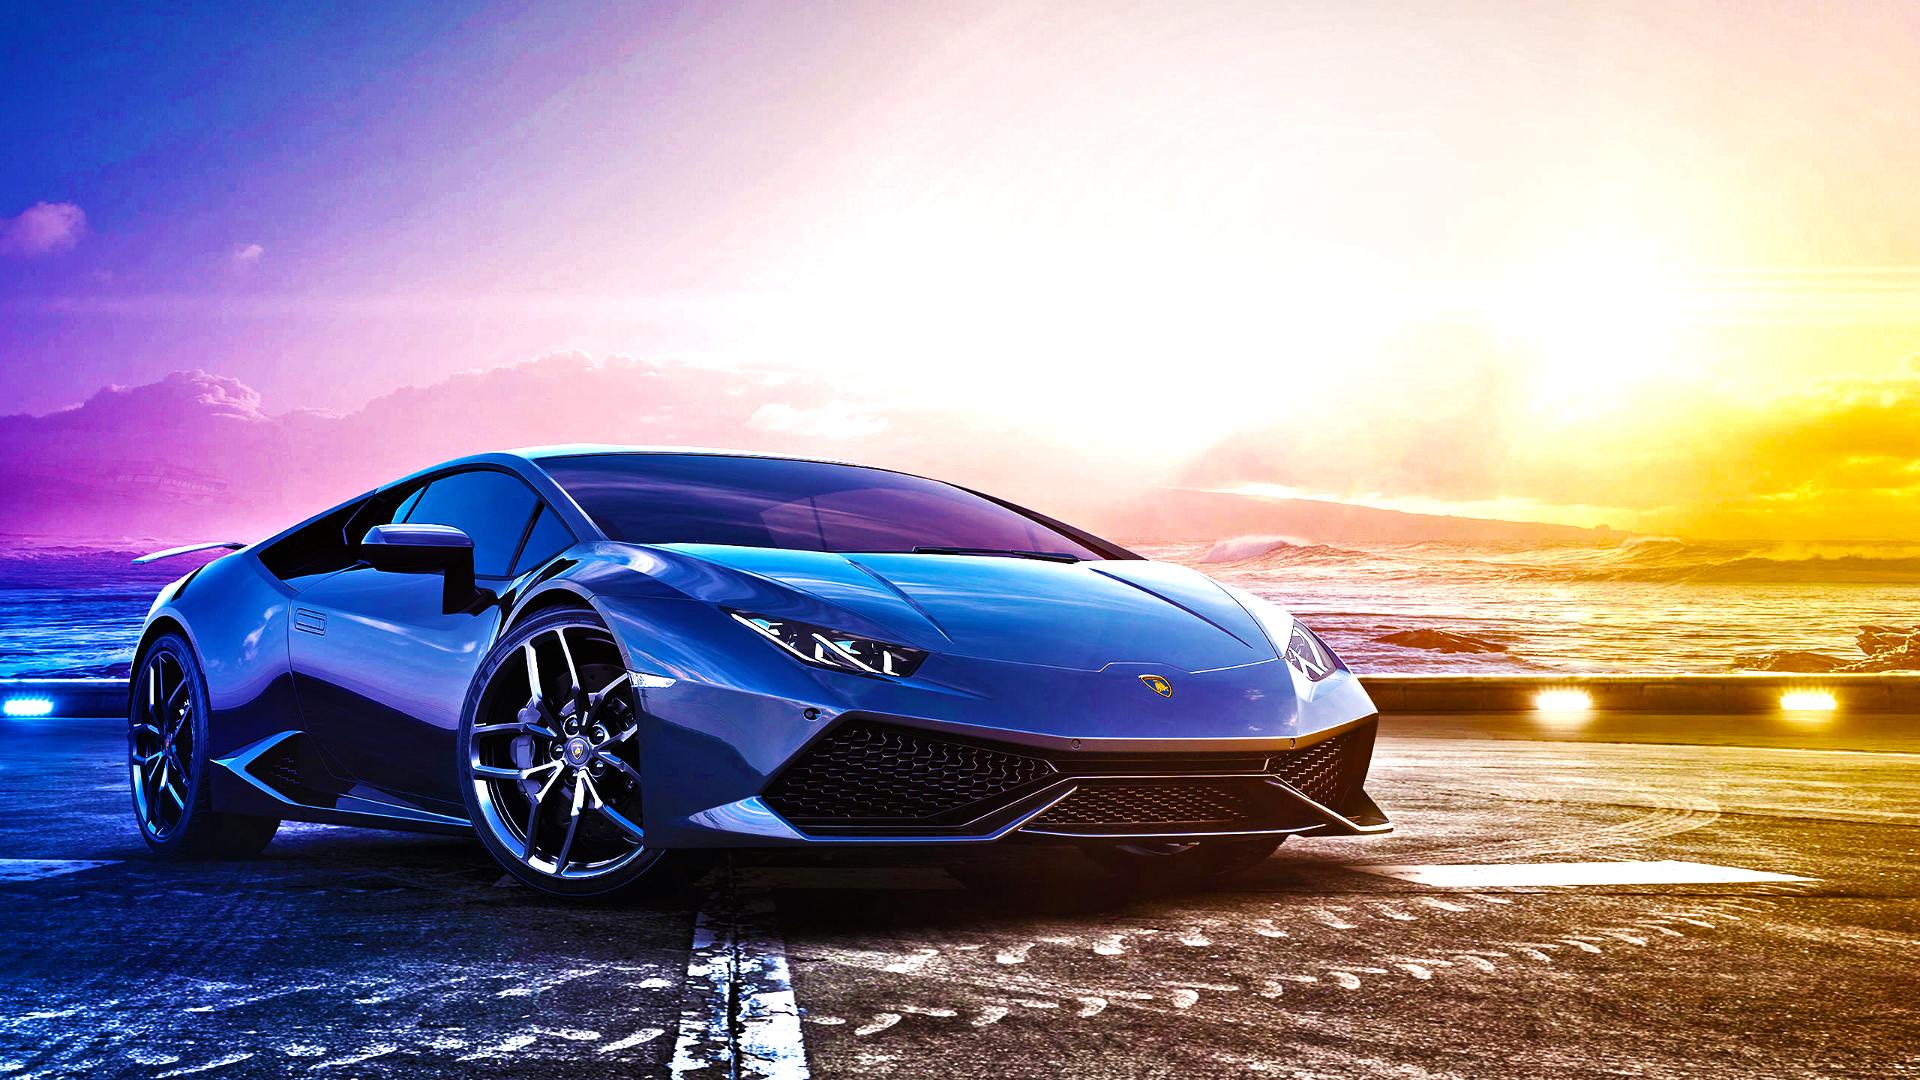 Lamborghini hd wallpaper background image 1920x1080 - Sports car pictures download ...